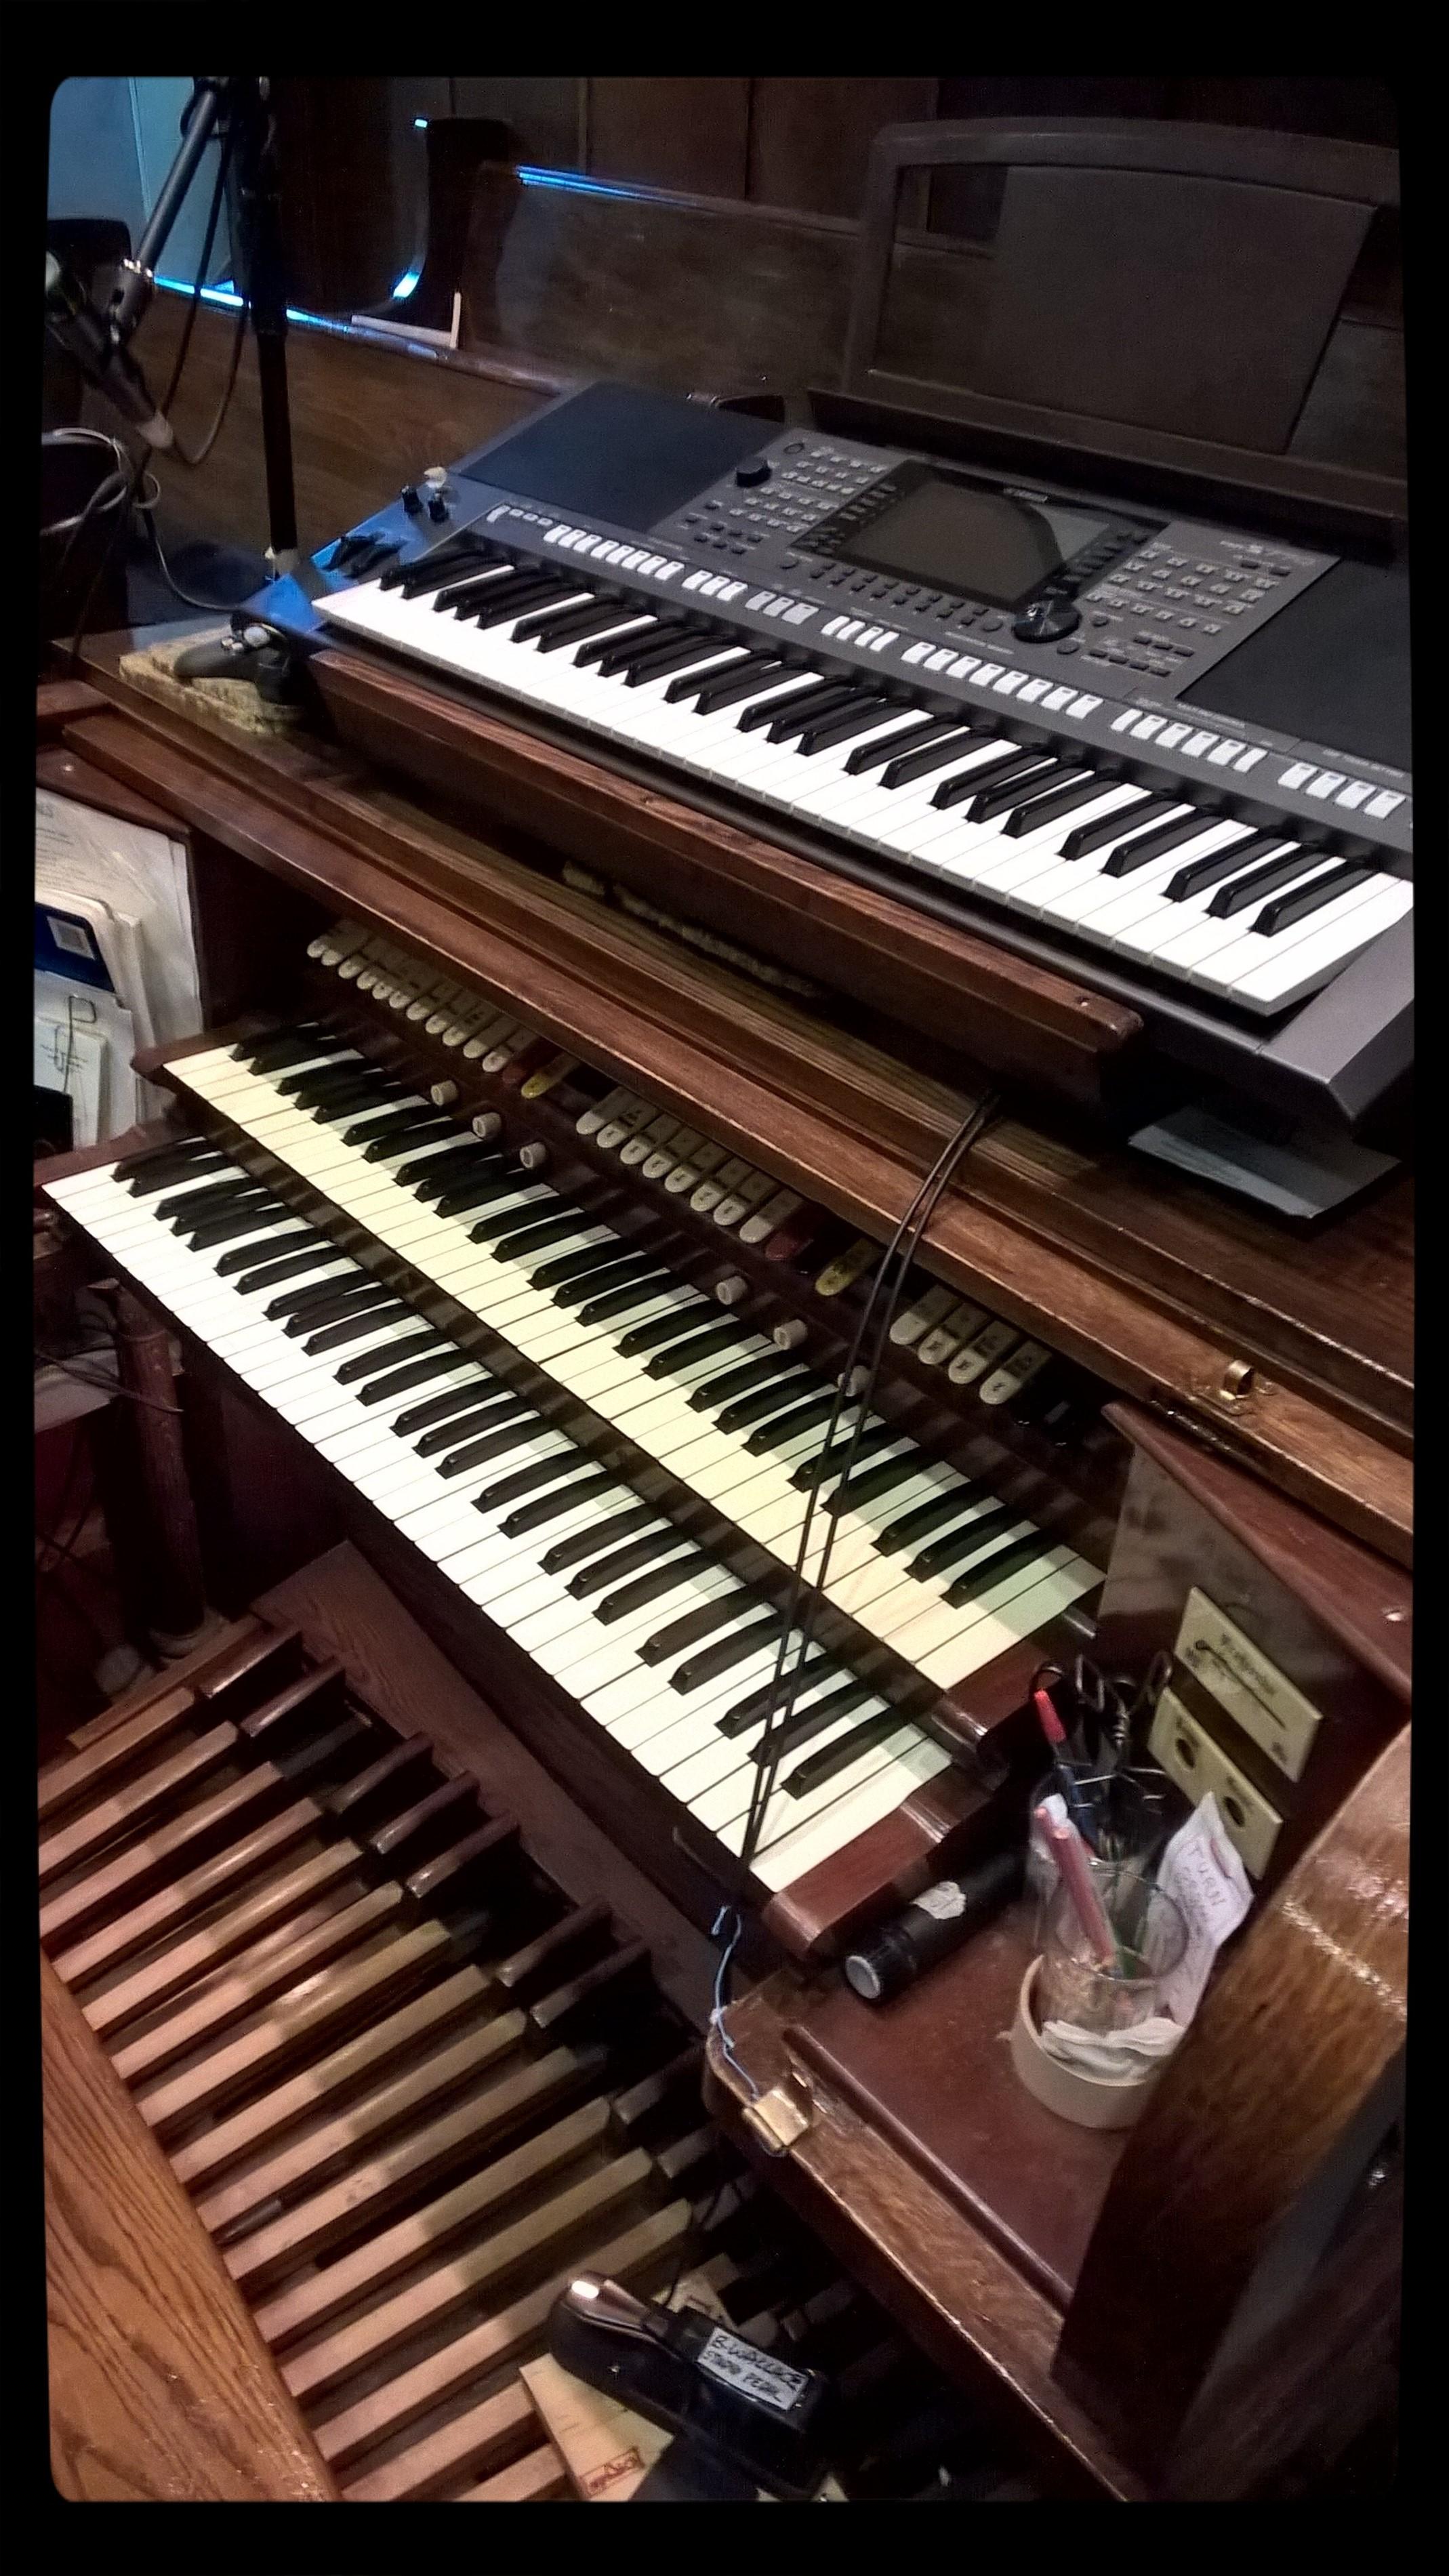 File:Keyboard and pipe organ combination jpg - Wikimedia Commons